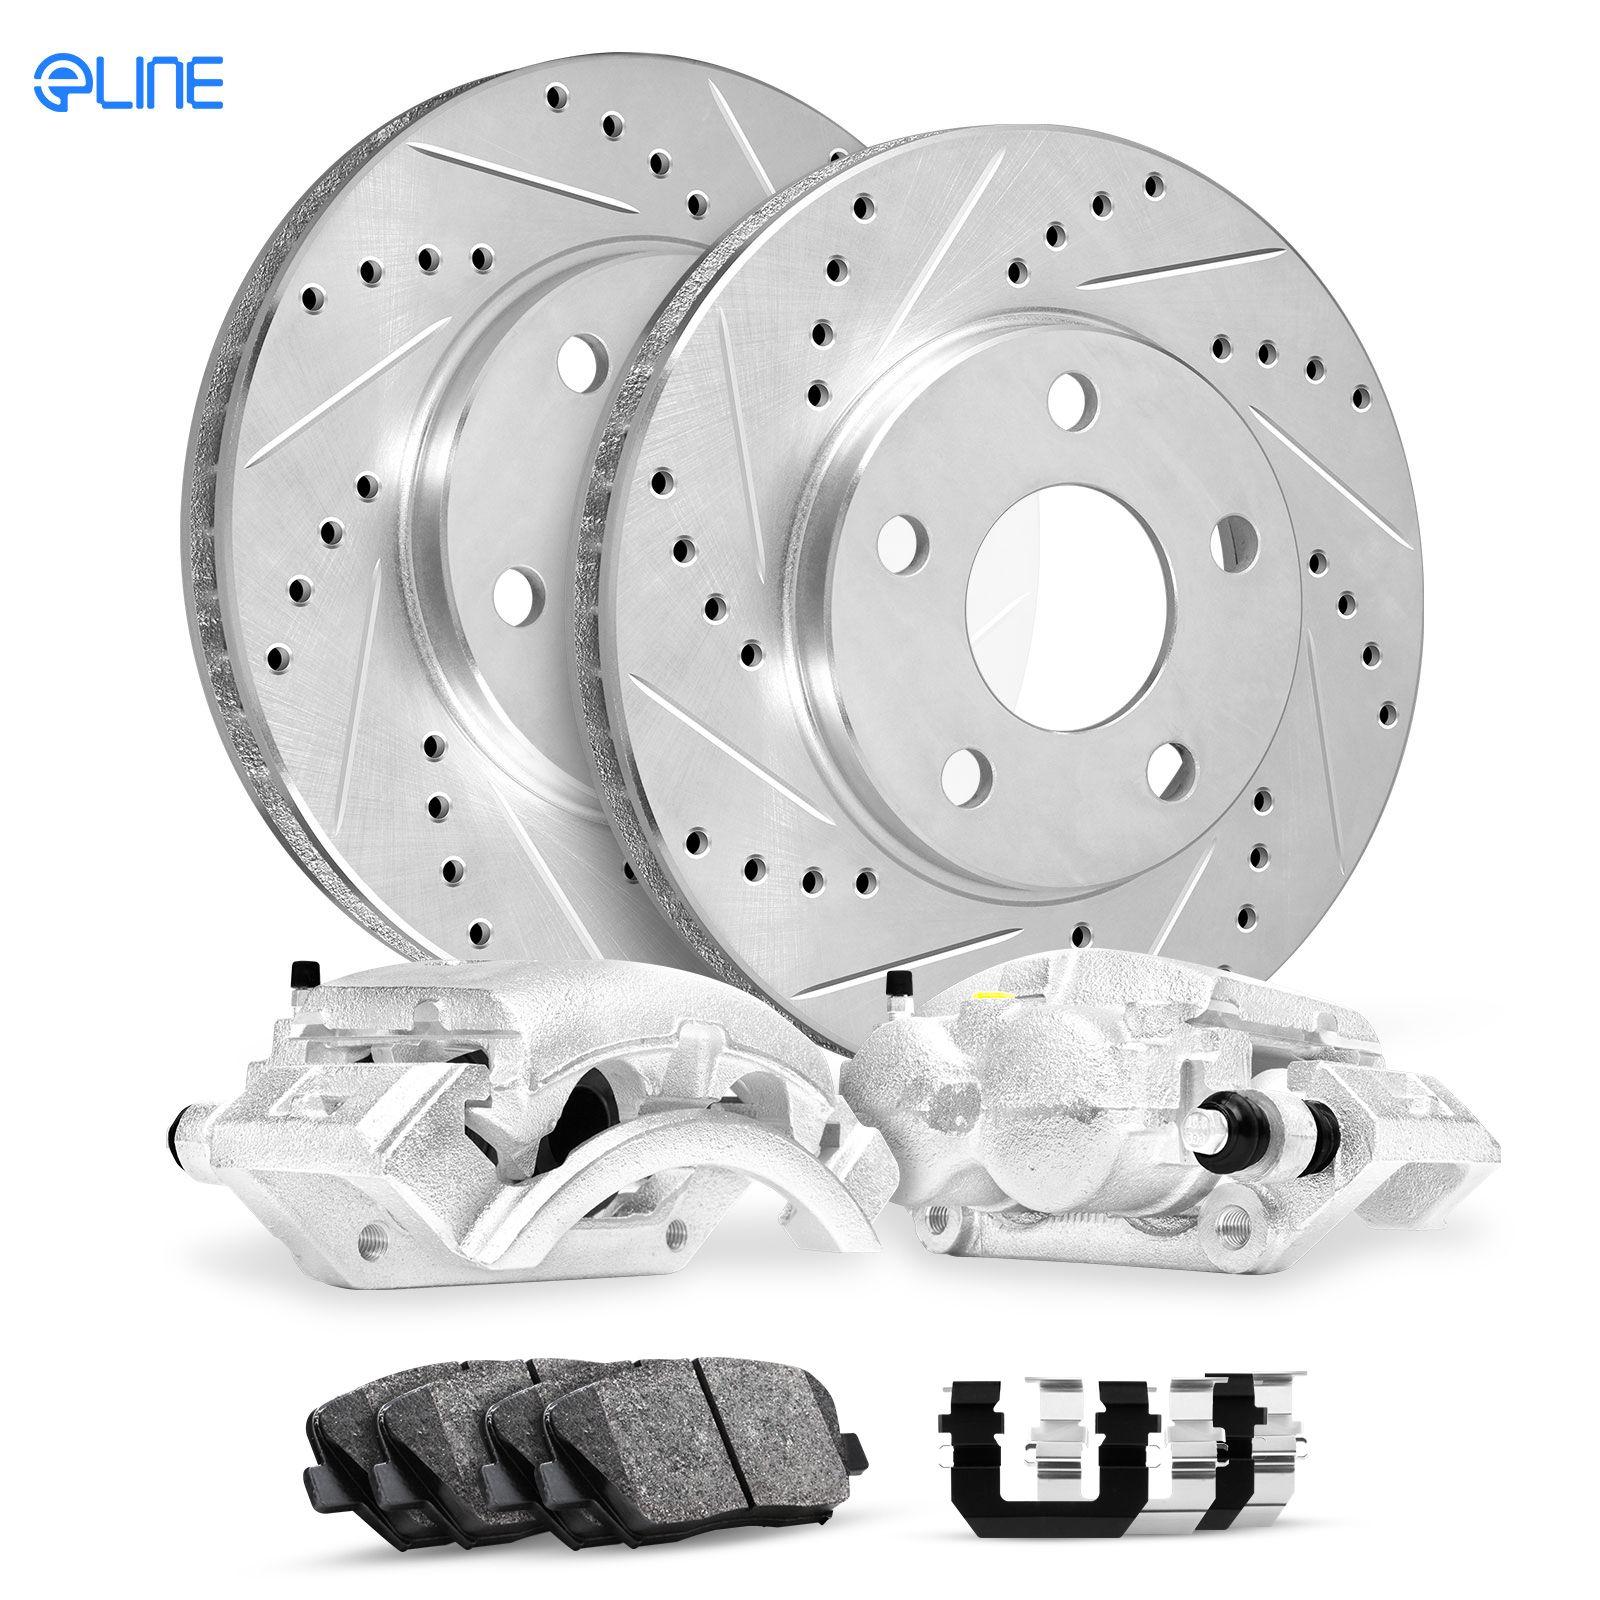 Galant Front Drill Slot Brake Rotors+Ceramic Brake Pads Fit Mitsubishi Eclipse